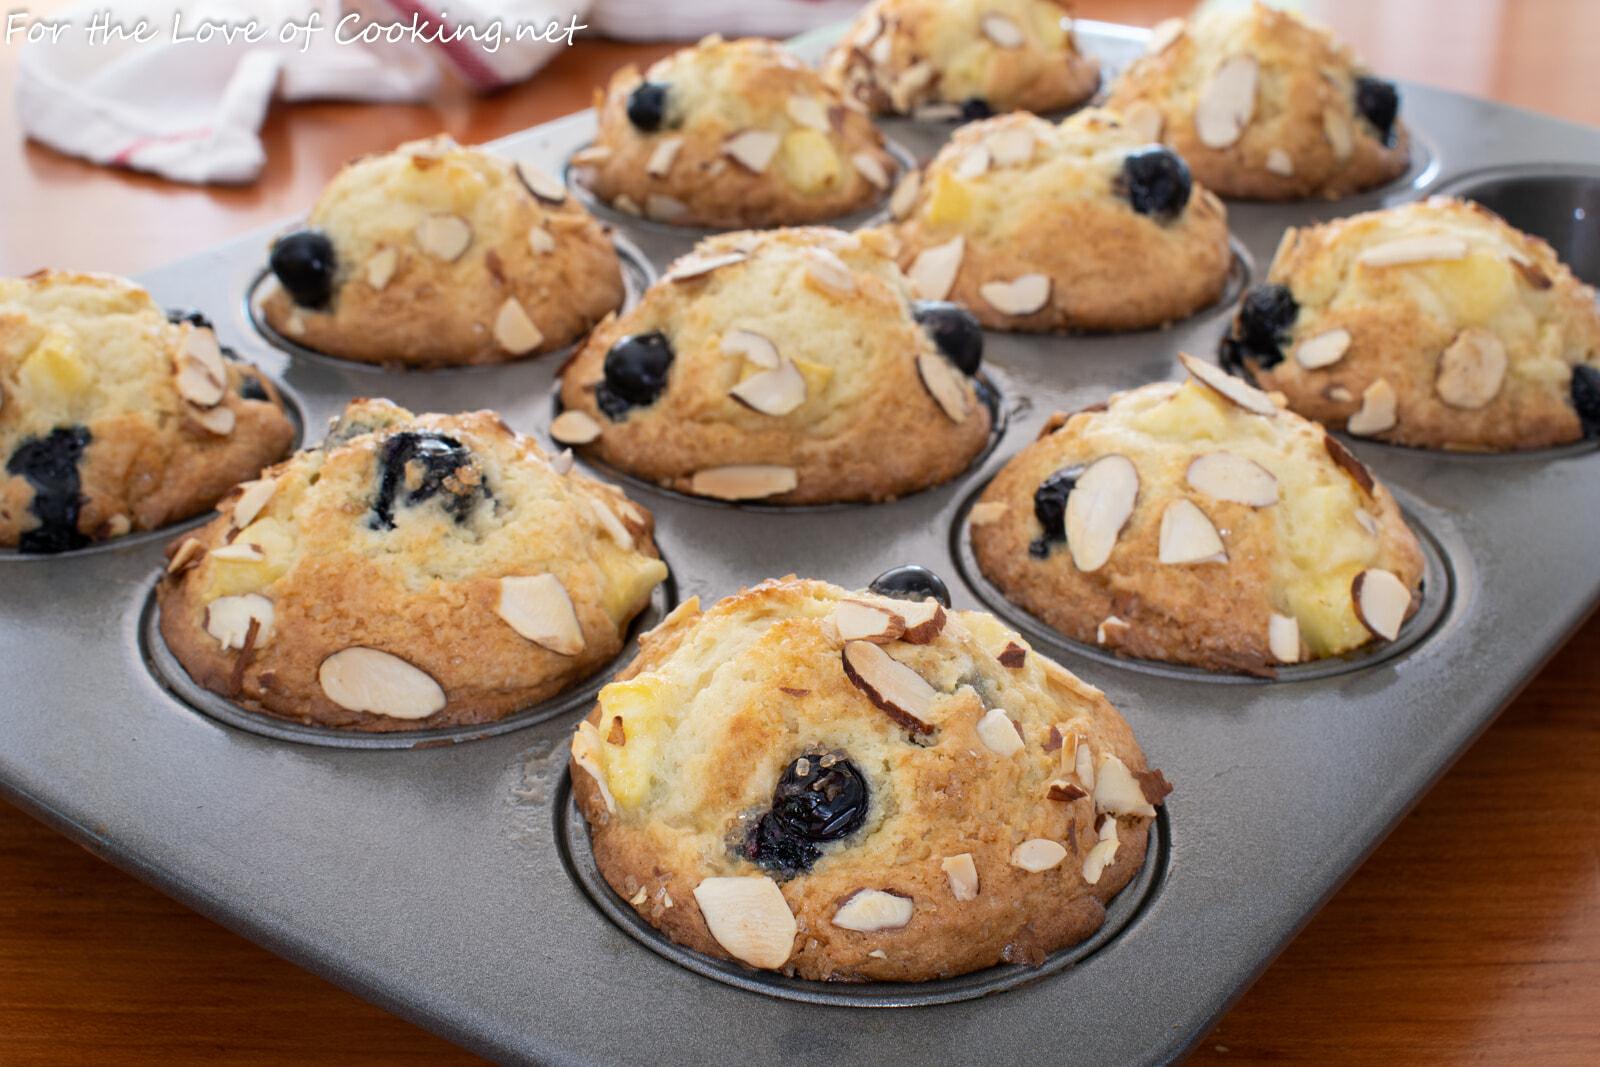 Blueberry-Nectarine Muffins